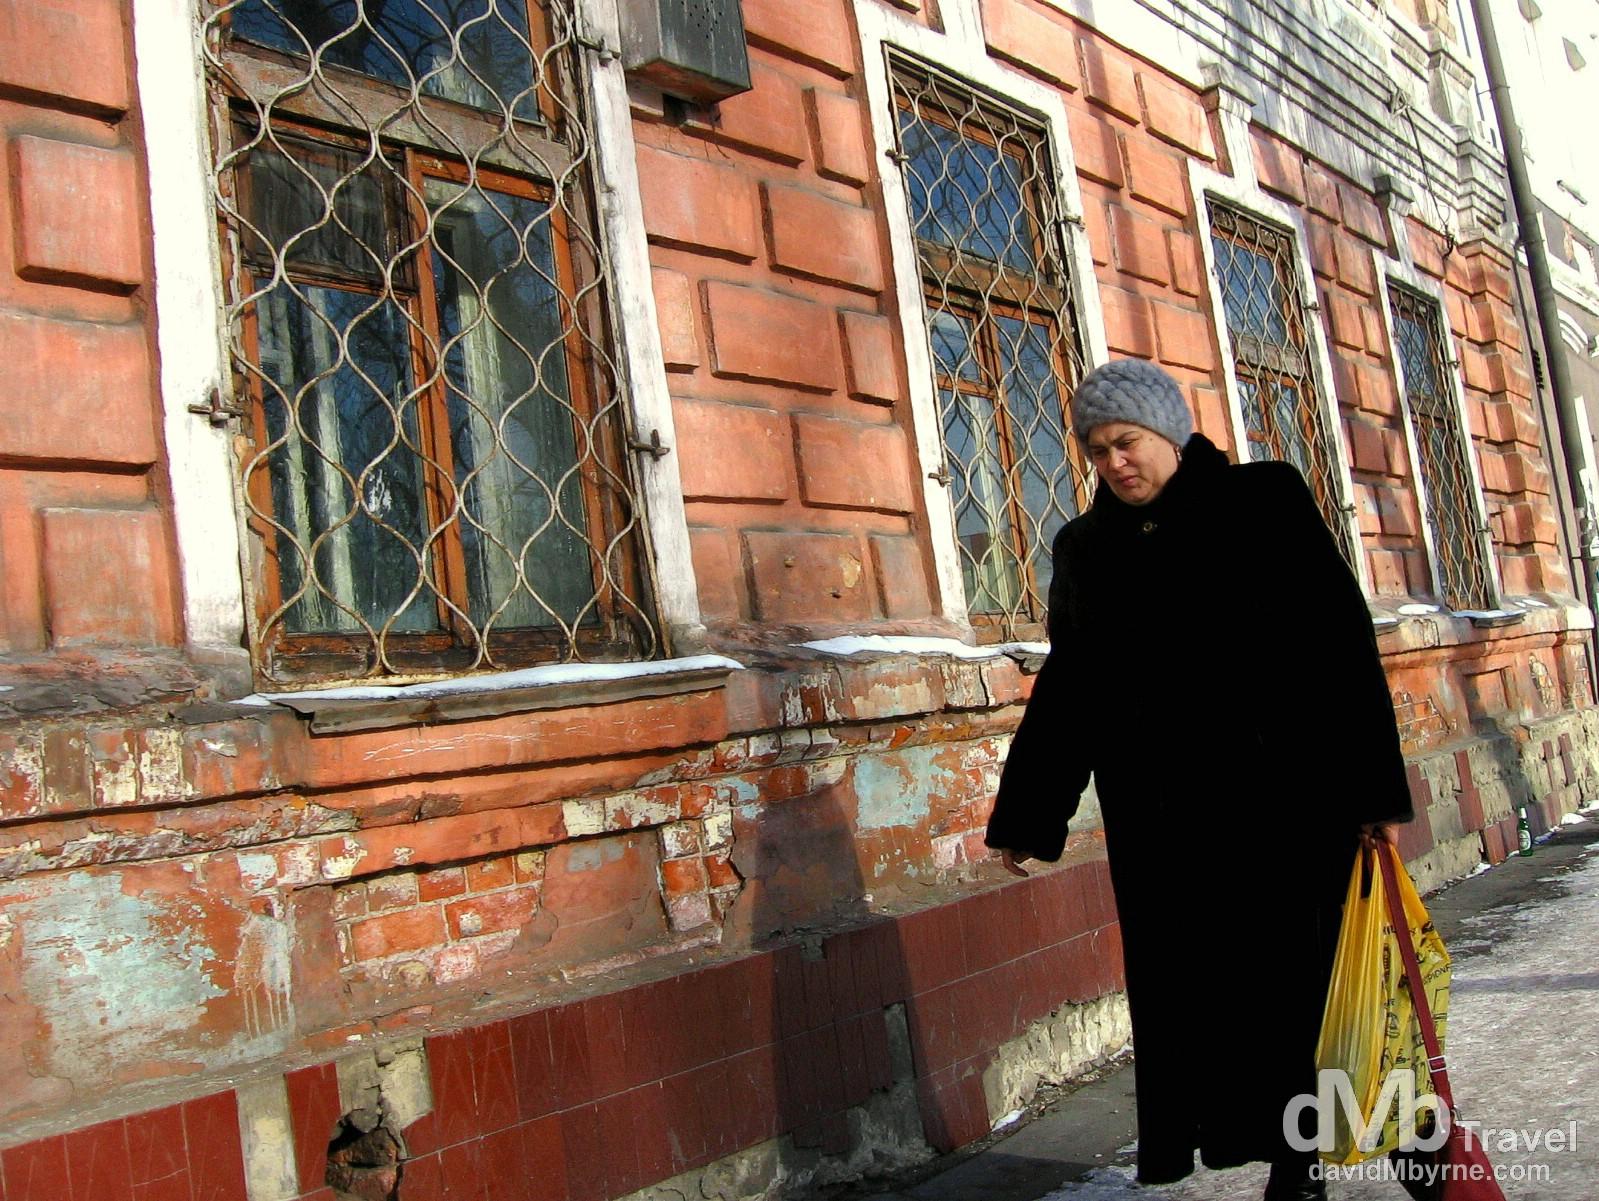 On the streets of Irkutsk, Siberian Russia. February 18, 2006.